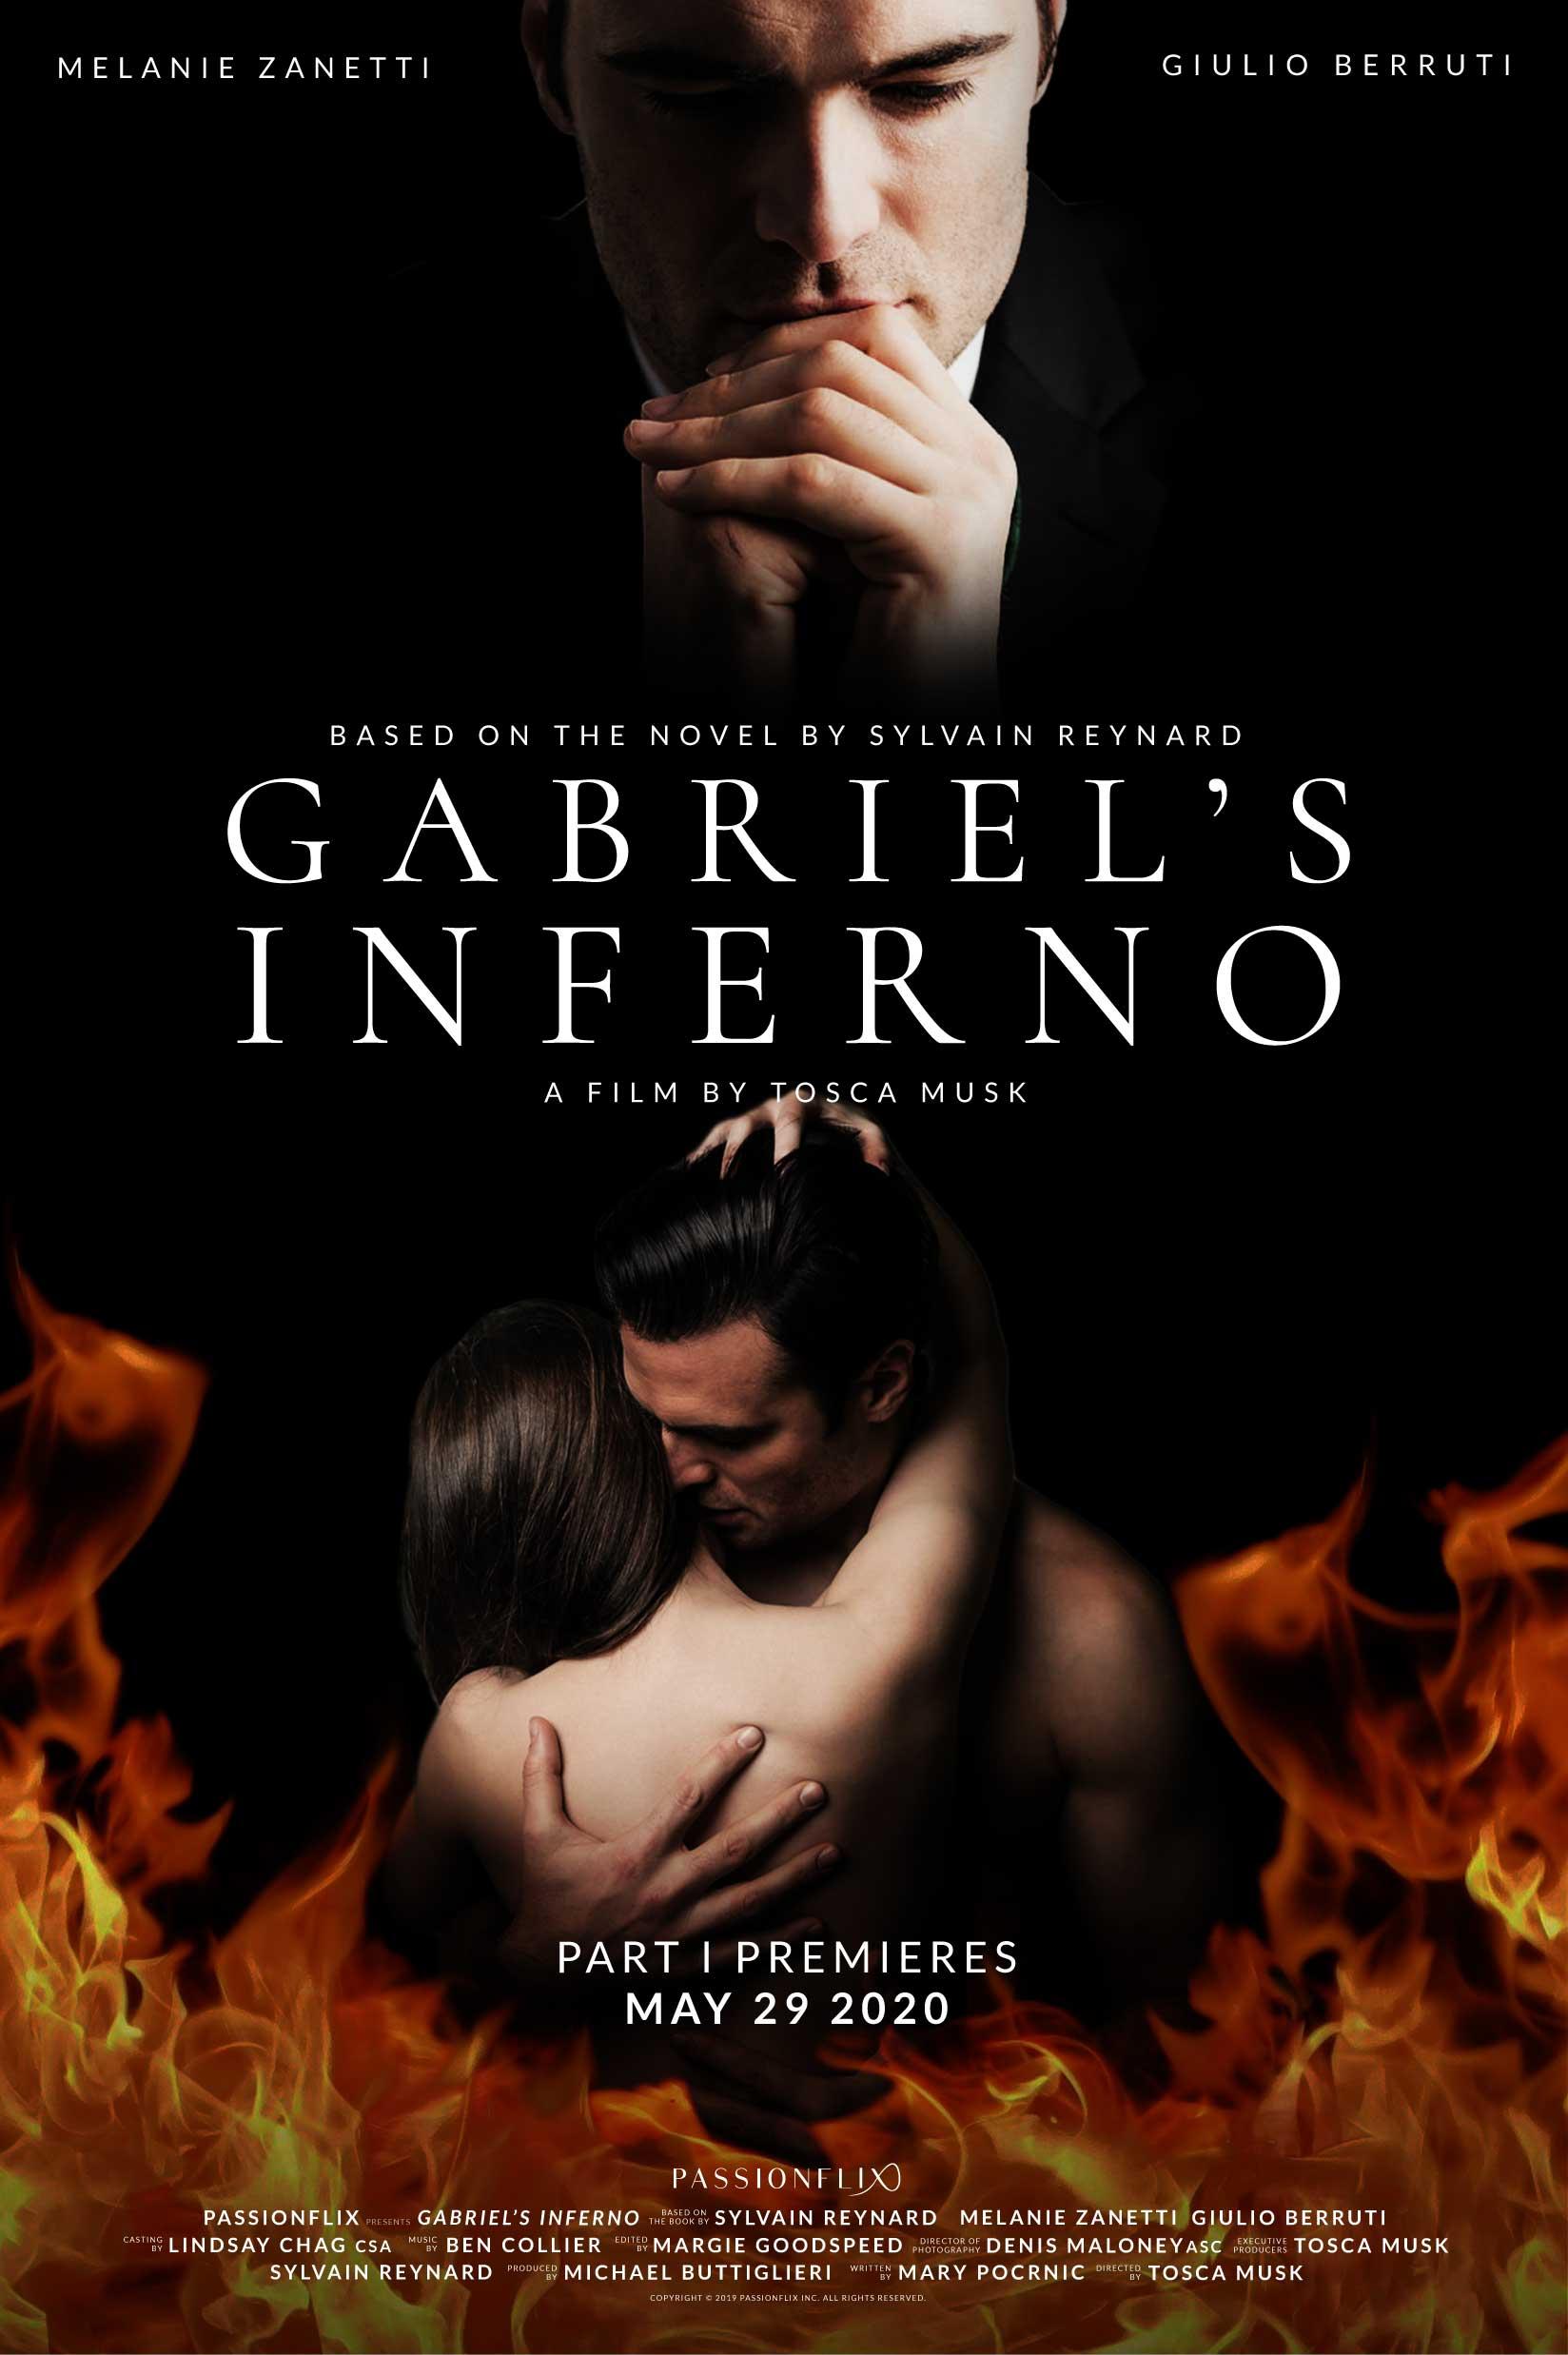 فيلم Gabriel's Inferno 2020 مترجم